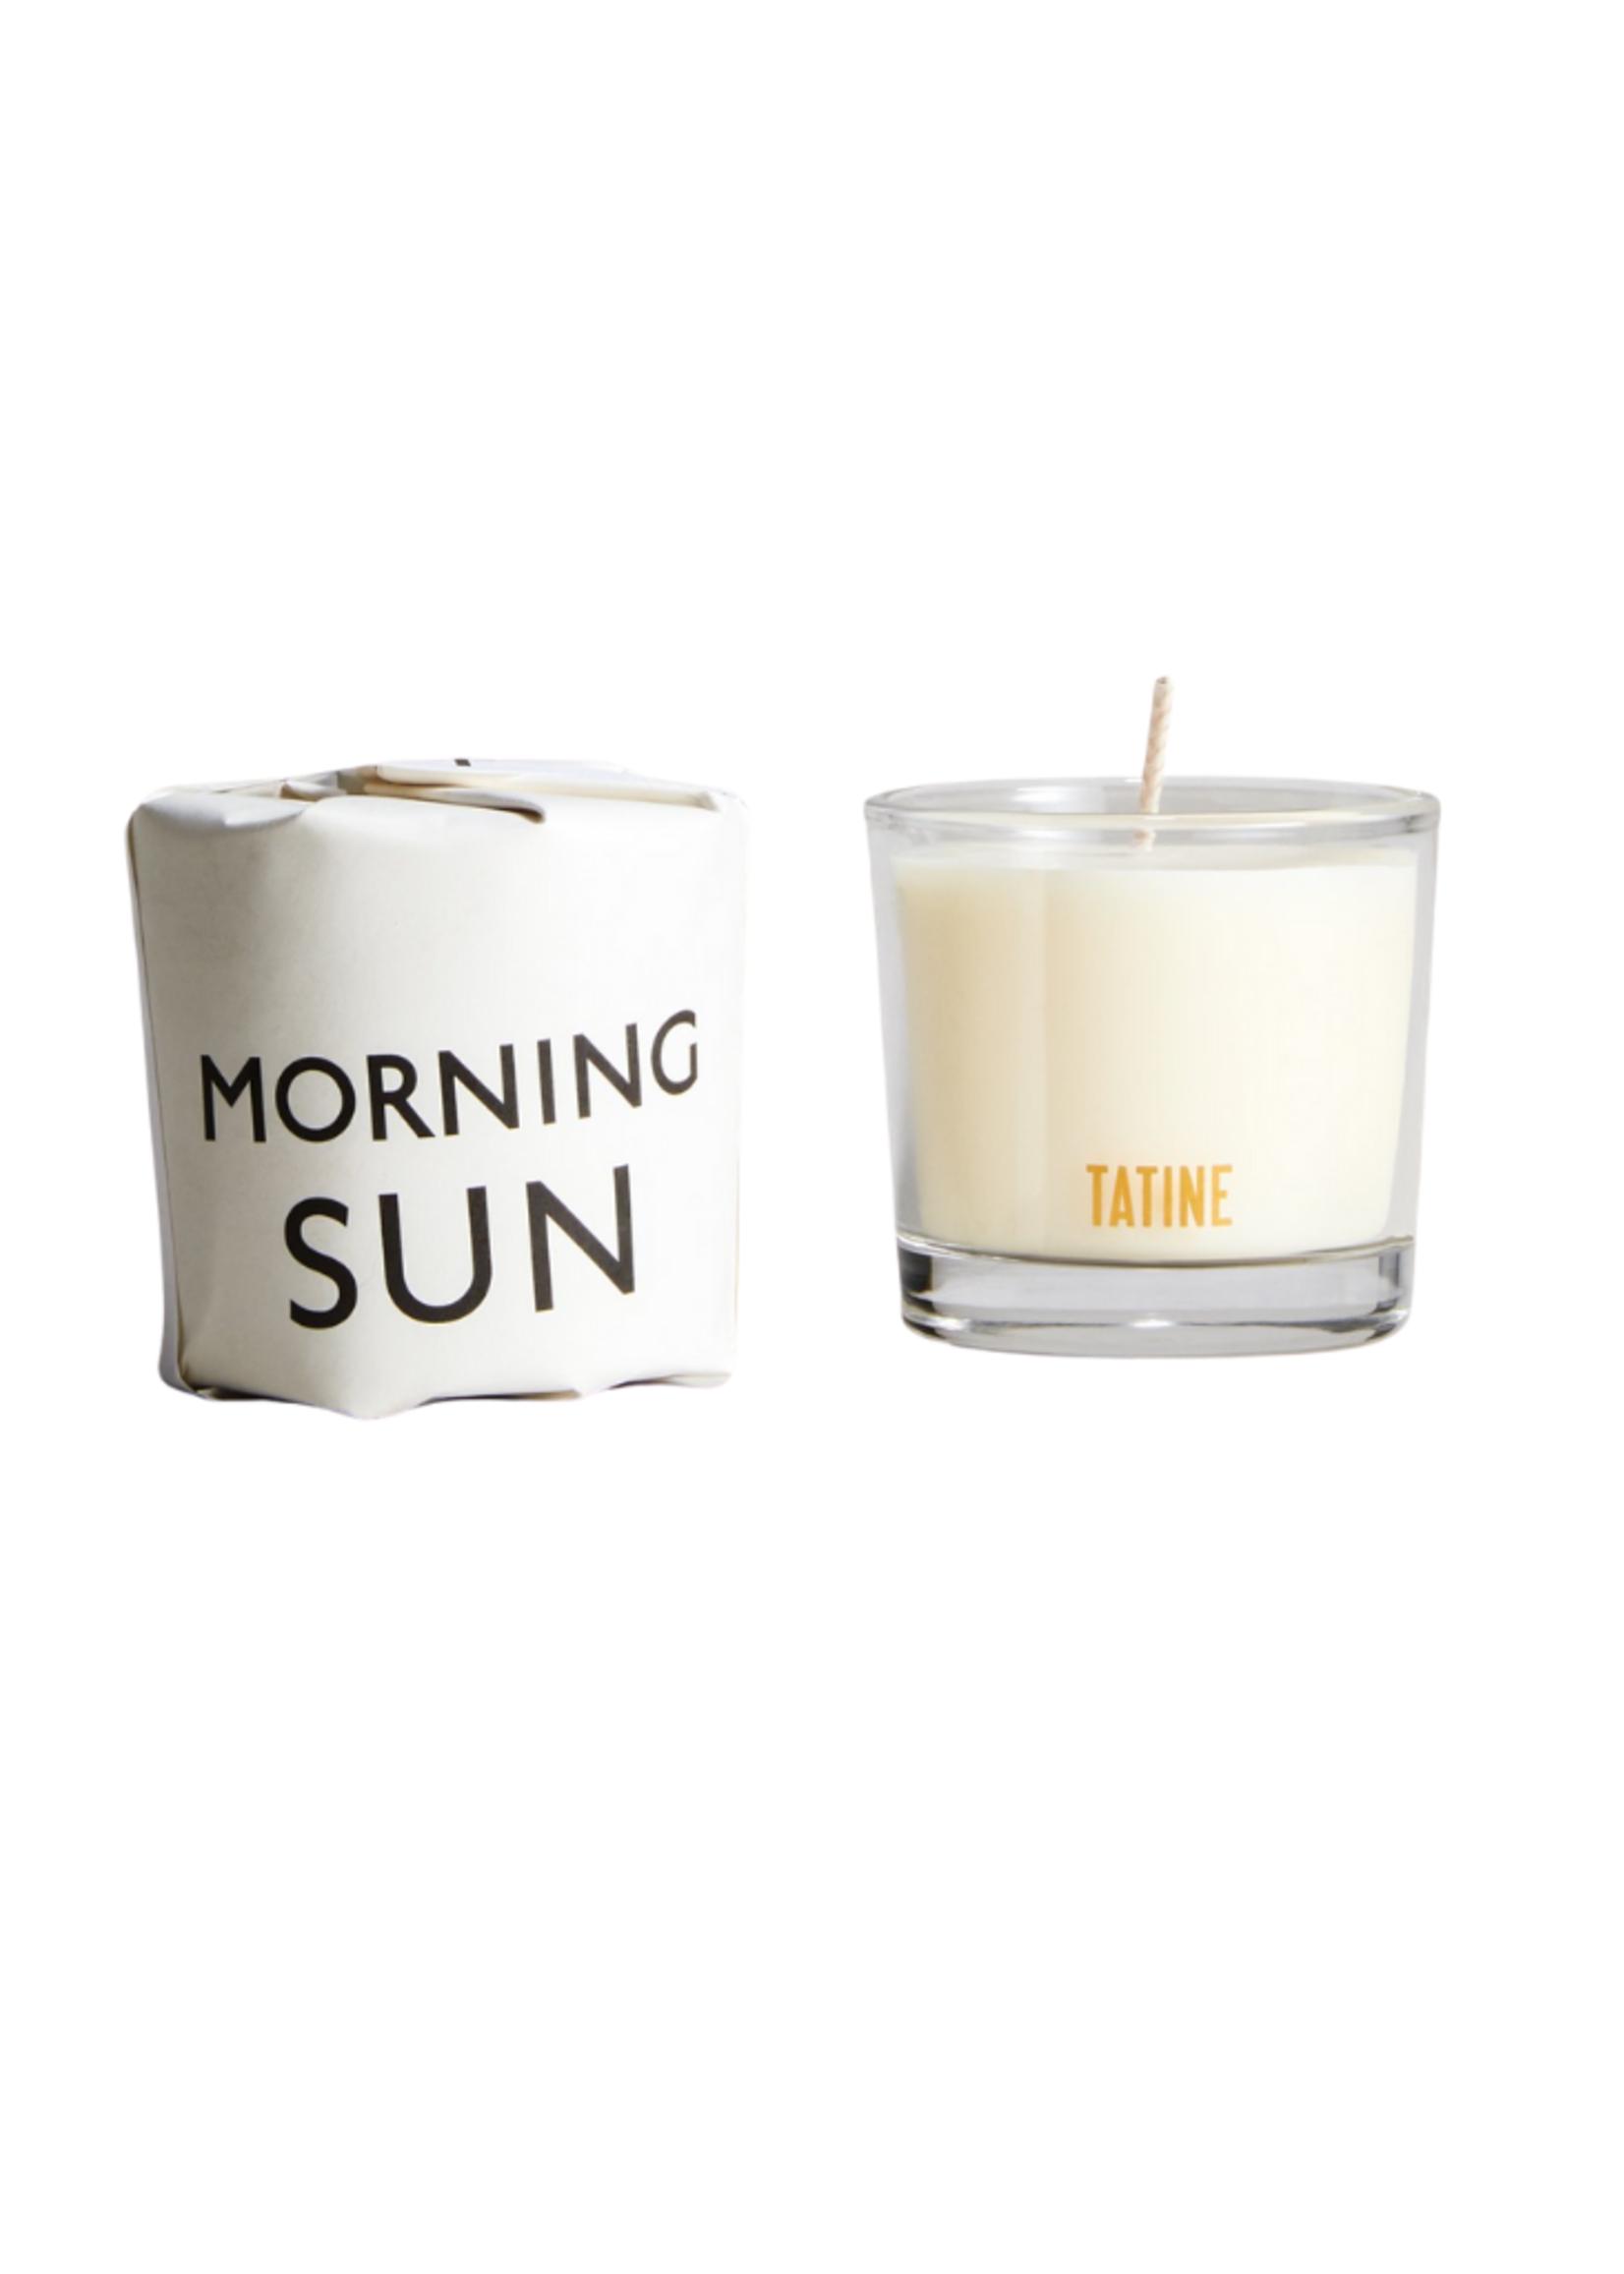 Tatine Morning Sun Votive Candle